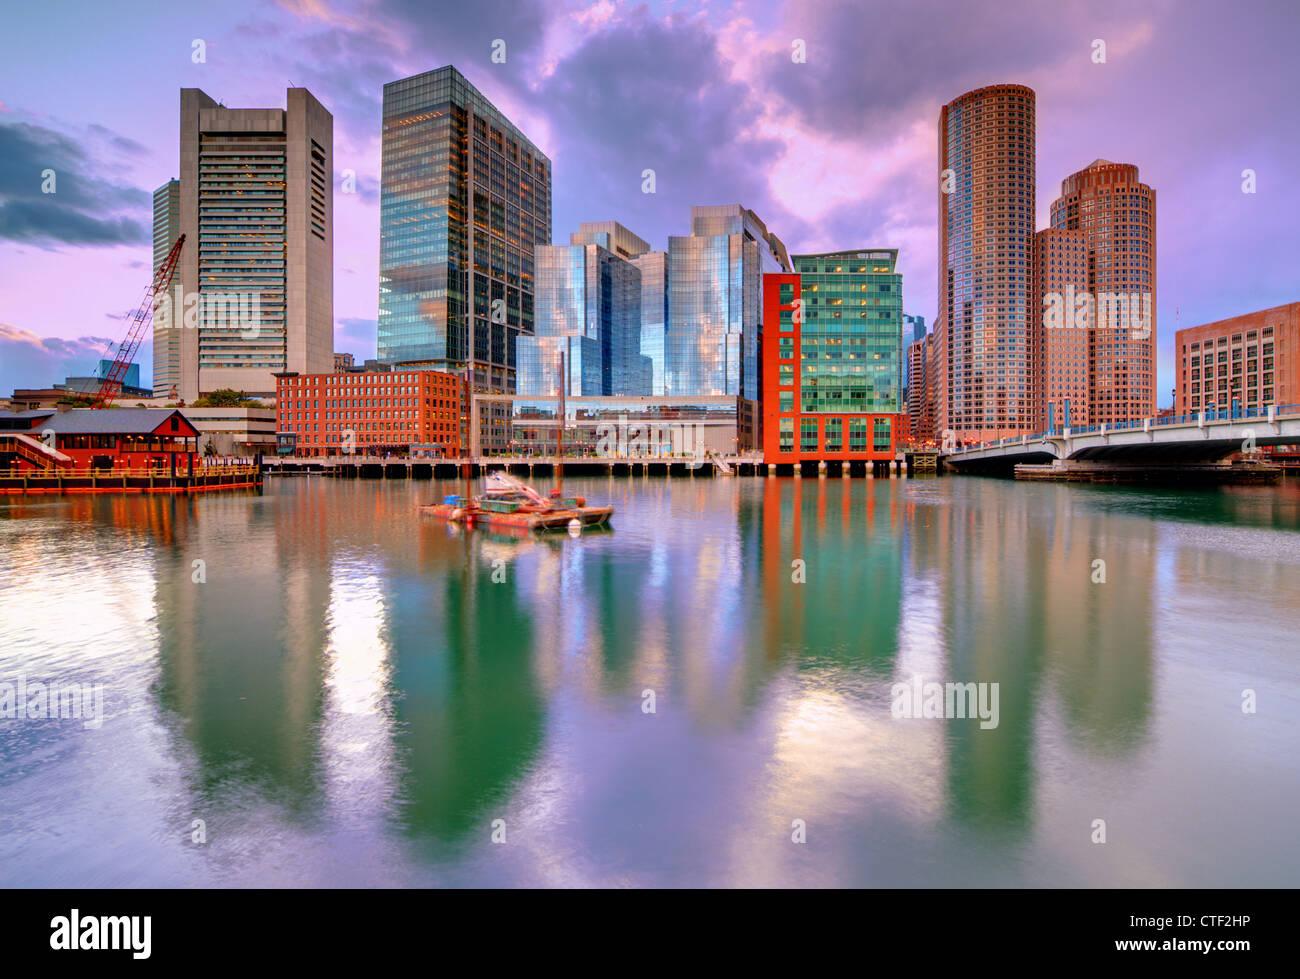 Skyline of downtown Boston, Massachusetts, USA - Stock Image